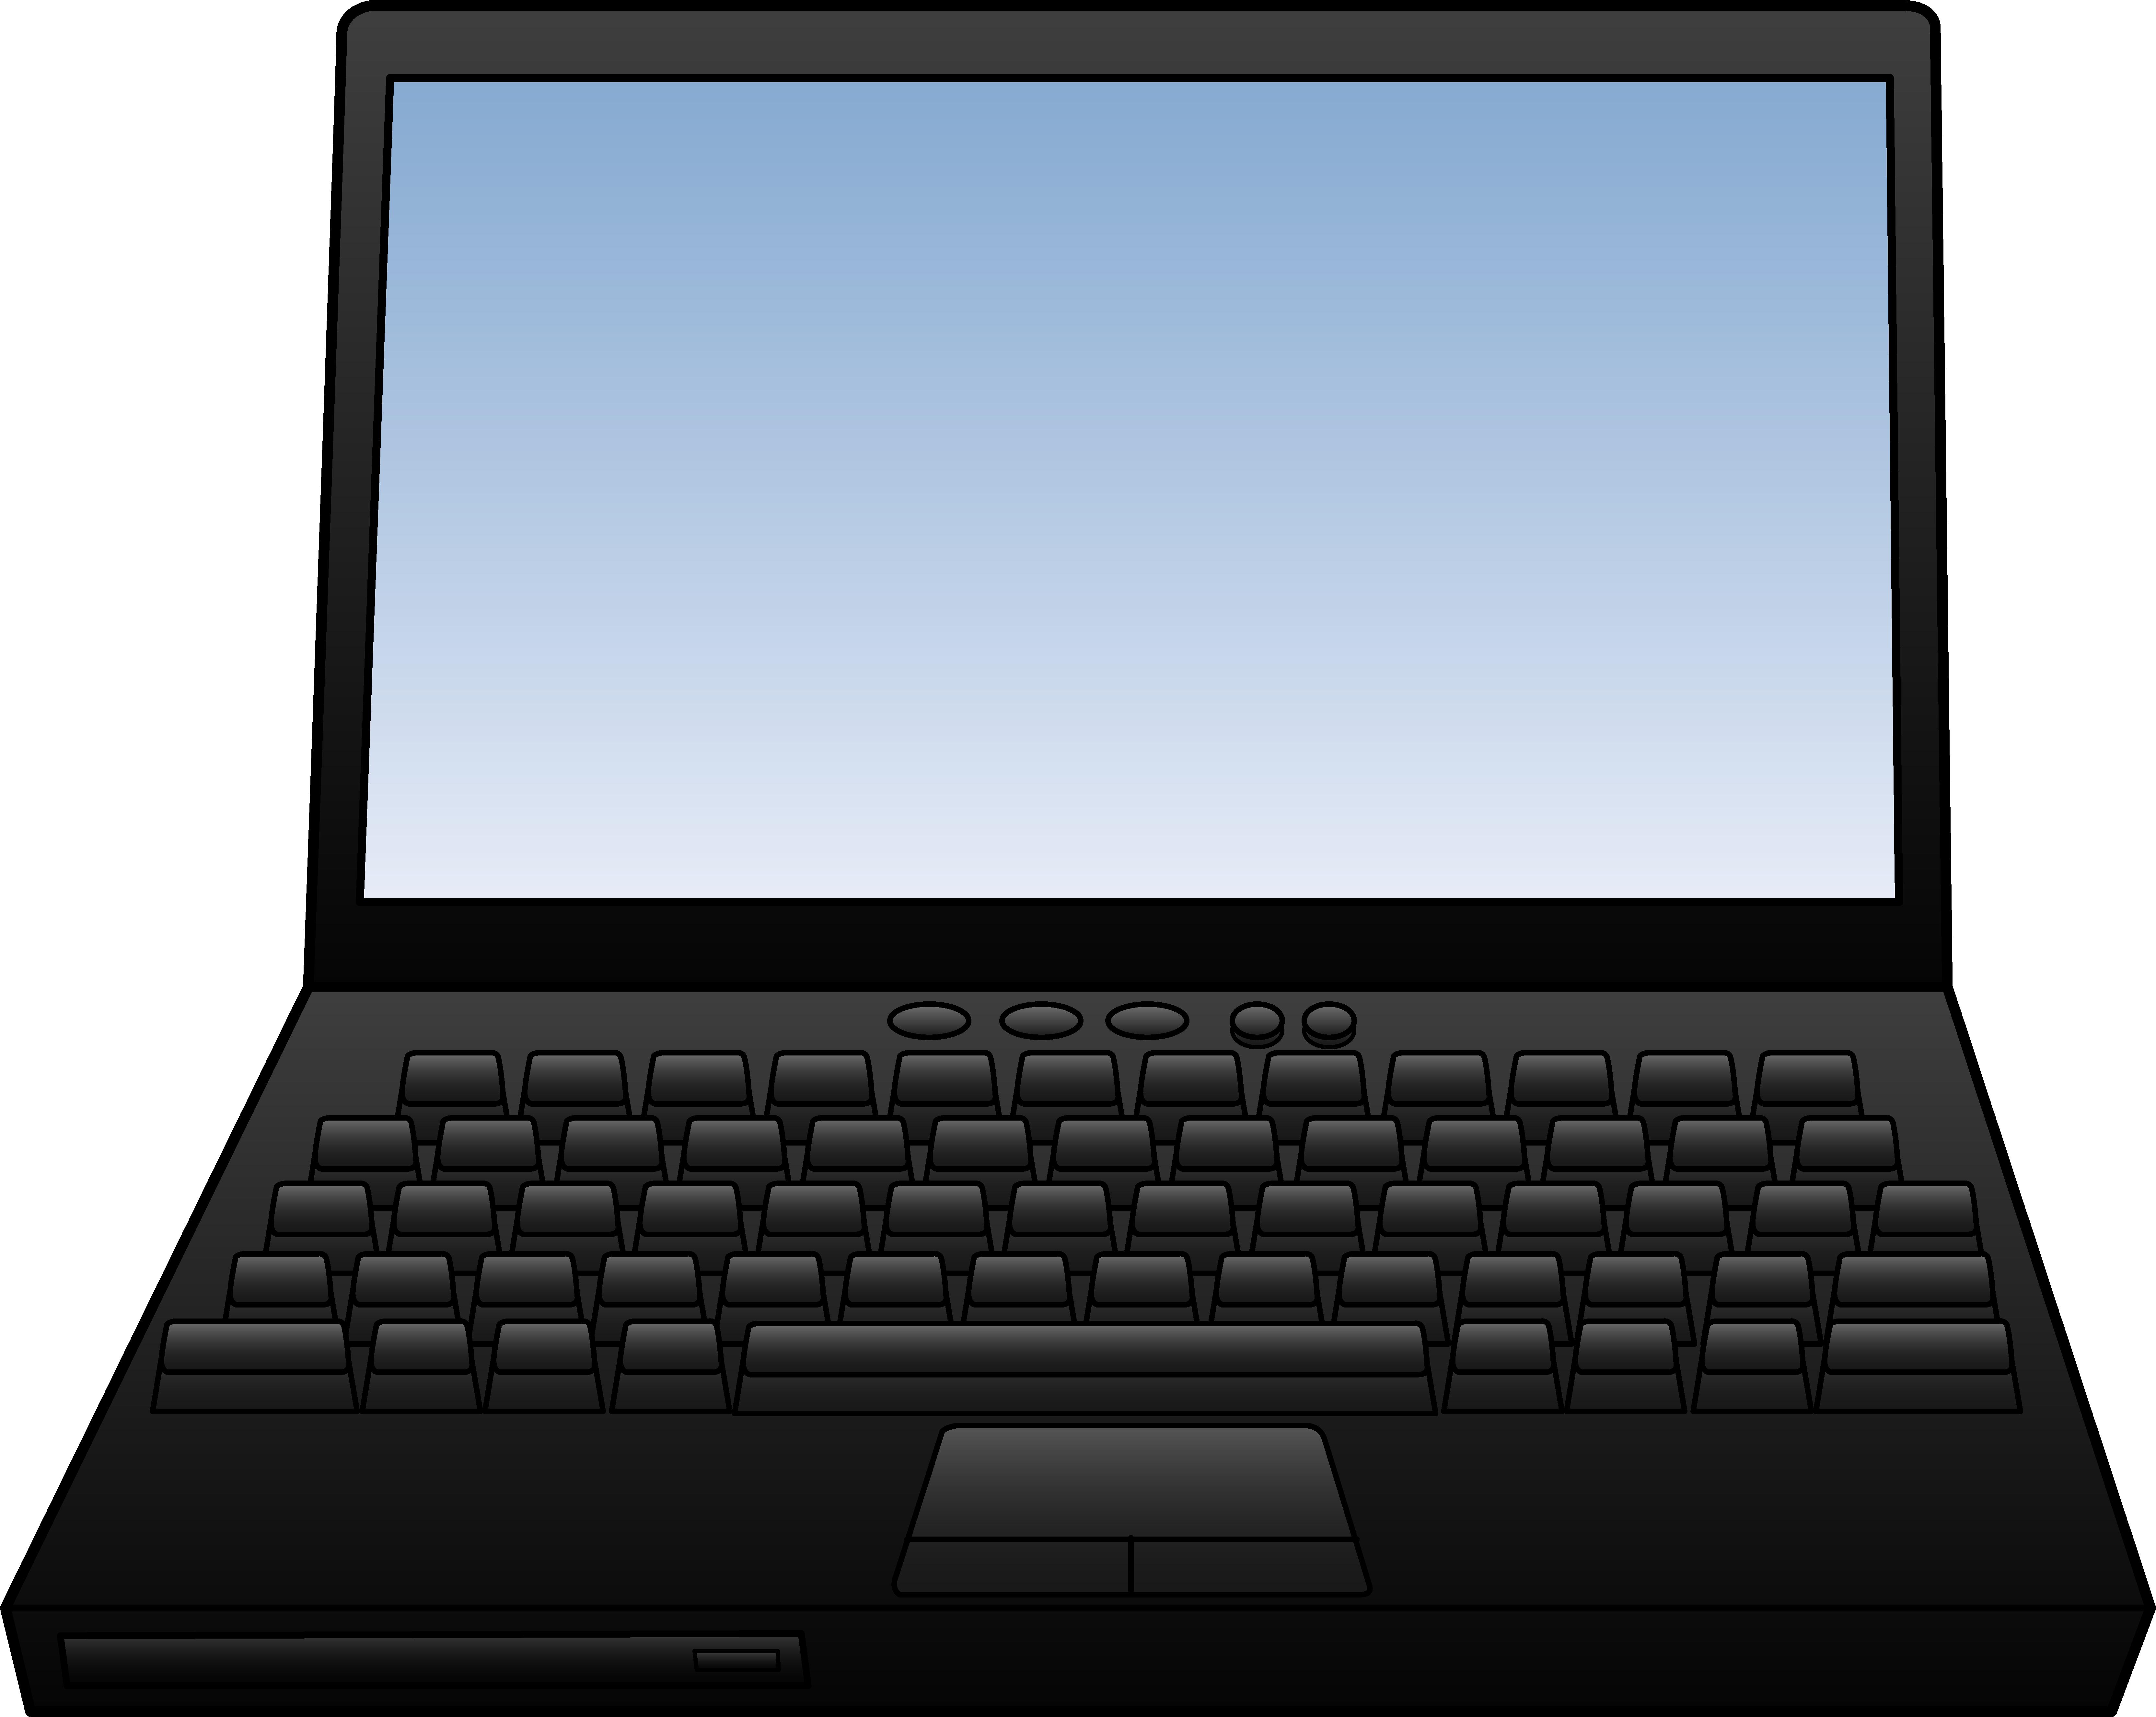 Laptop Computer keyboard Clip art.